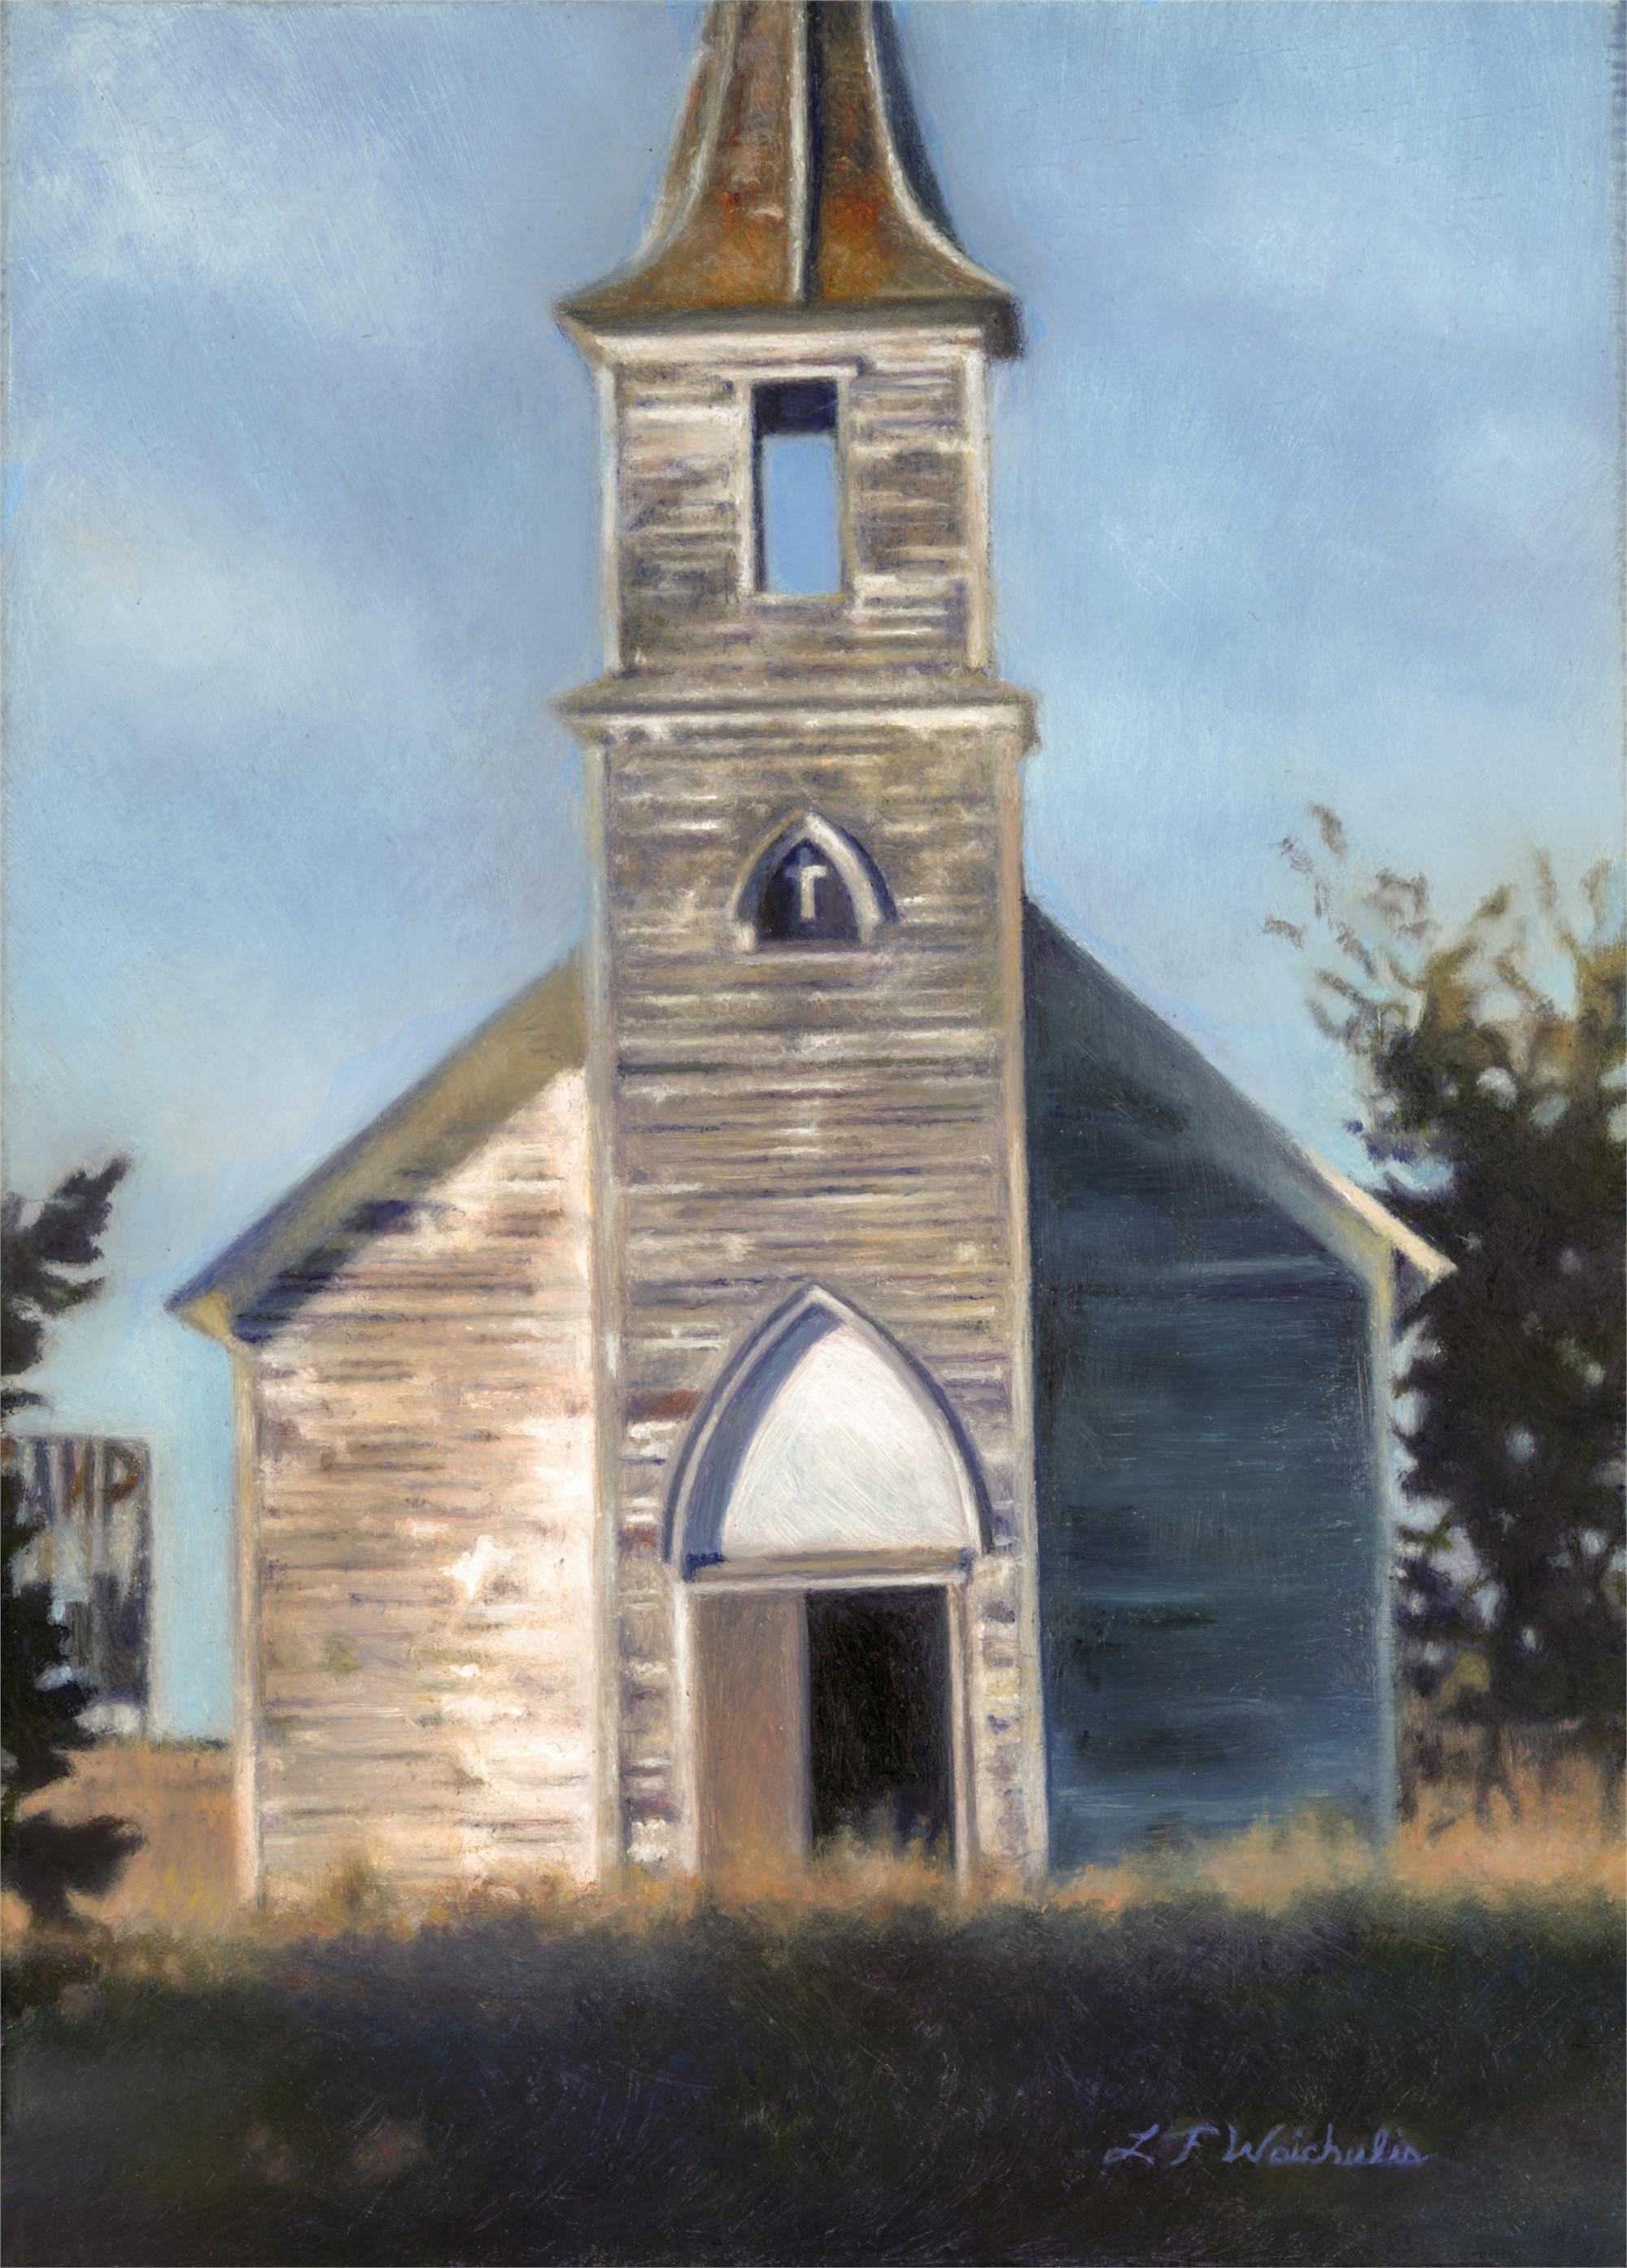 Wayside Chapel by Leah Waichulis